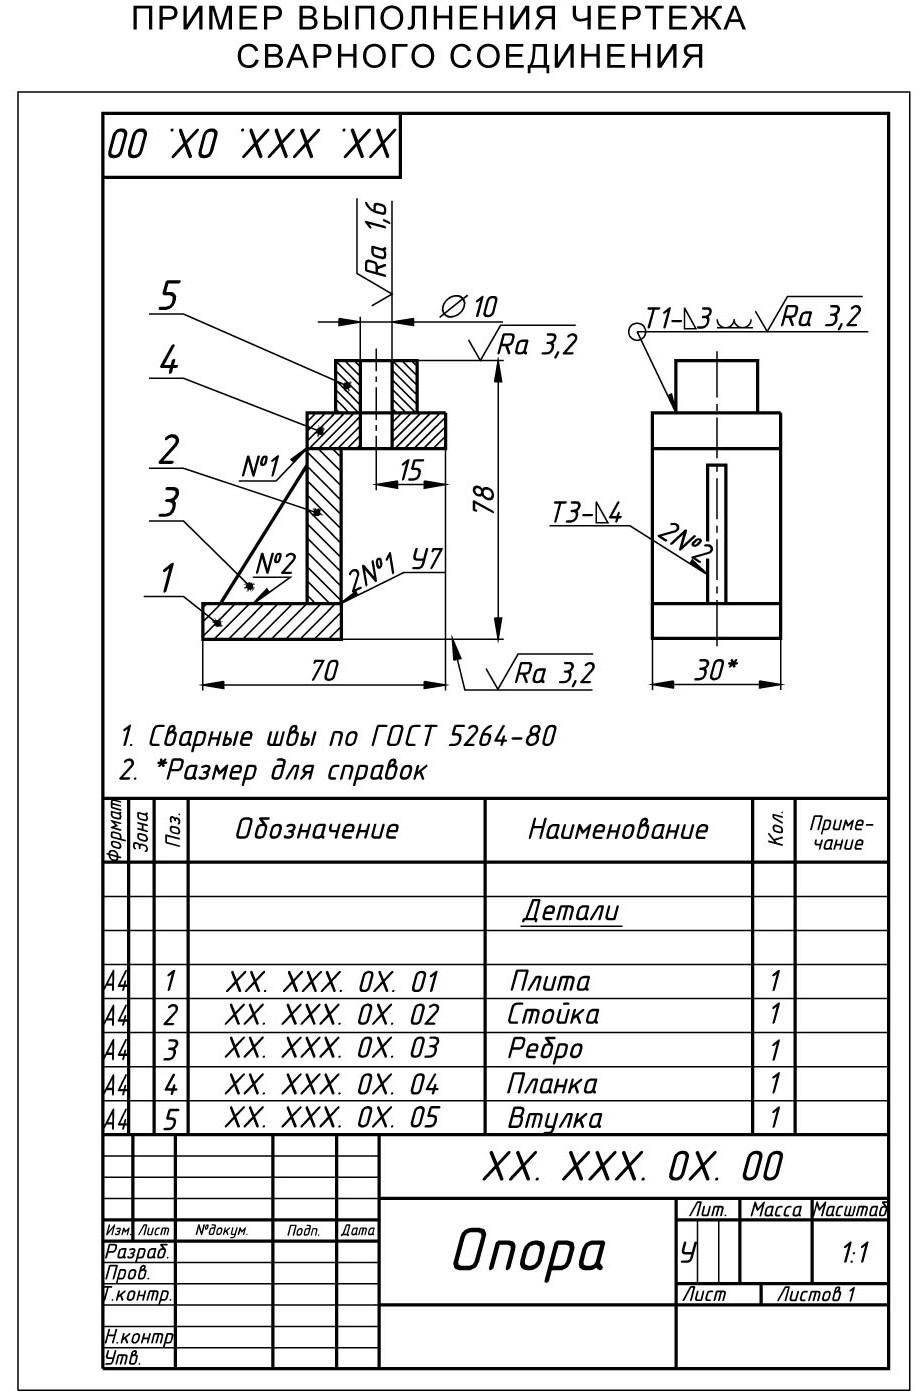 C:\Documents and Settings\Администратор.DE32EC8A91F240F.002\Рабочий стол\image023.jpg